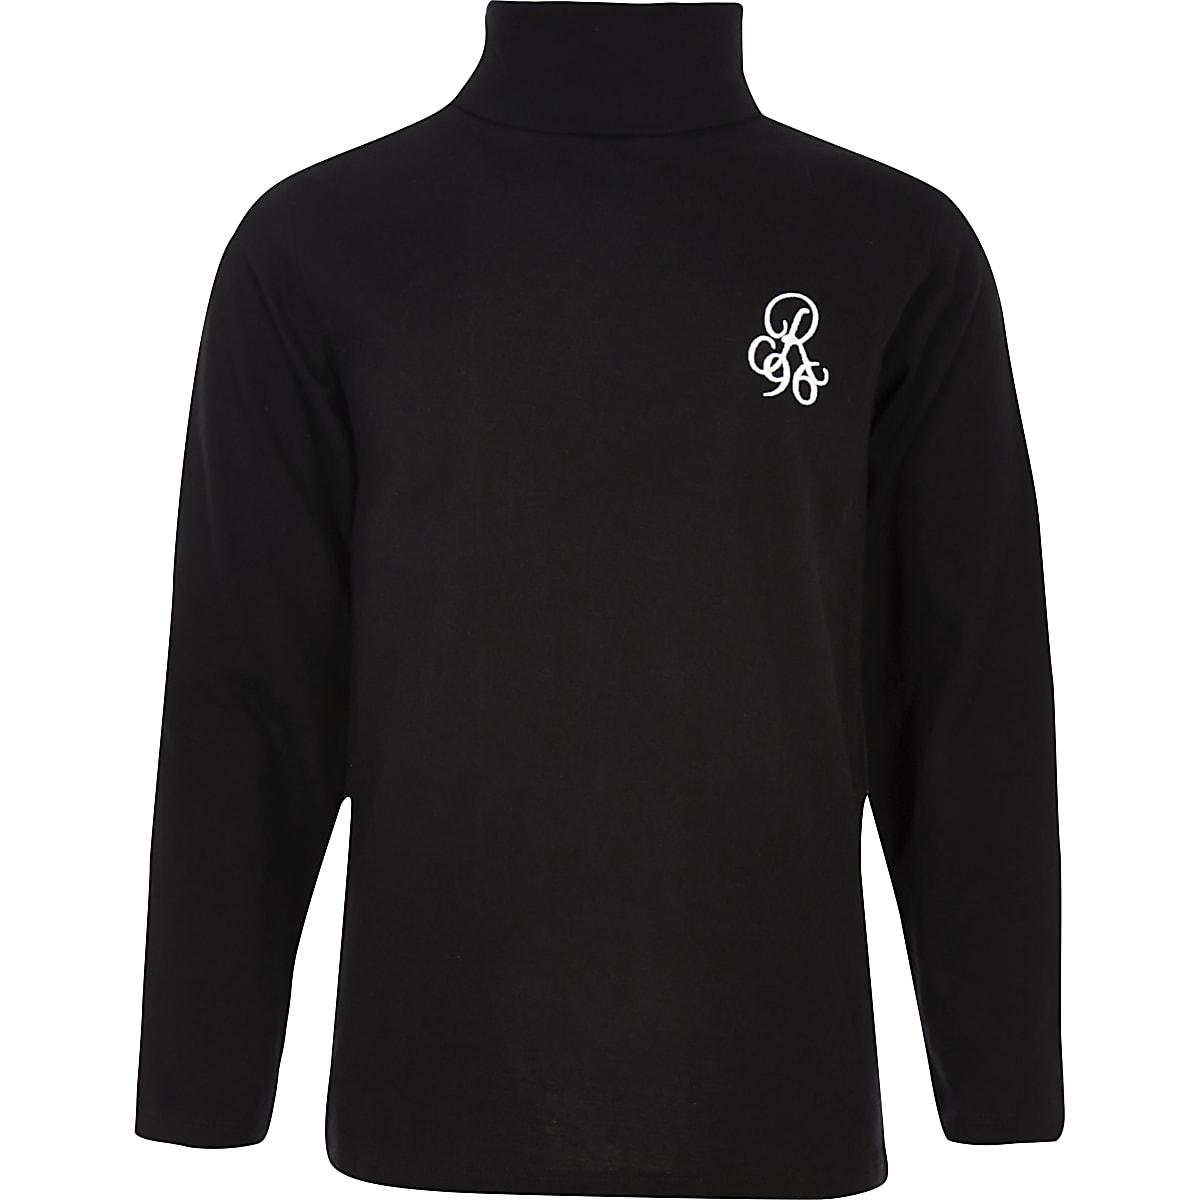 Boys black 'R96' roll neck top